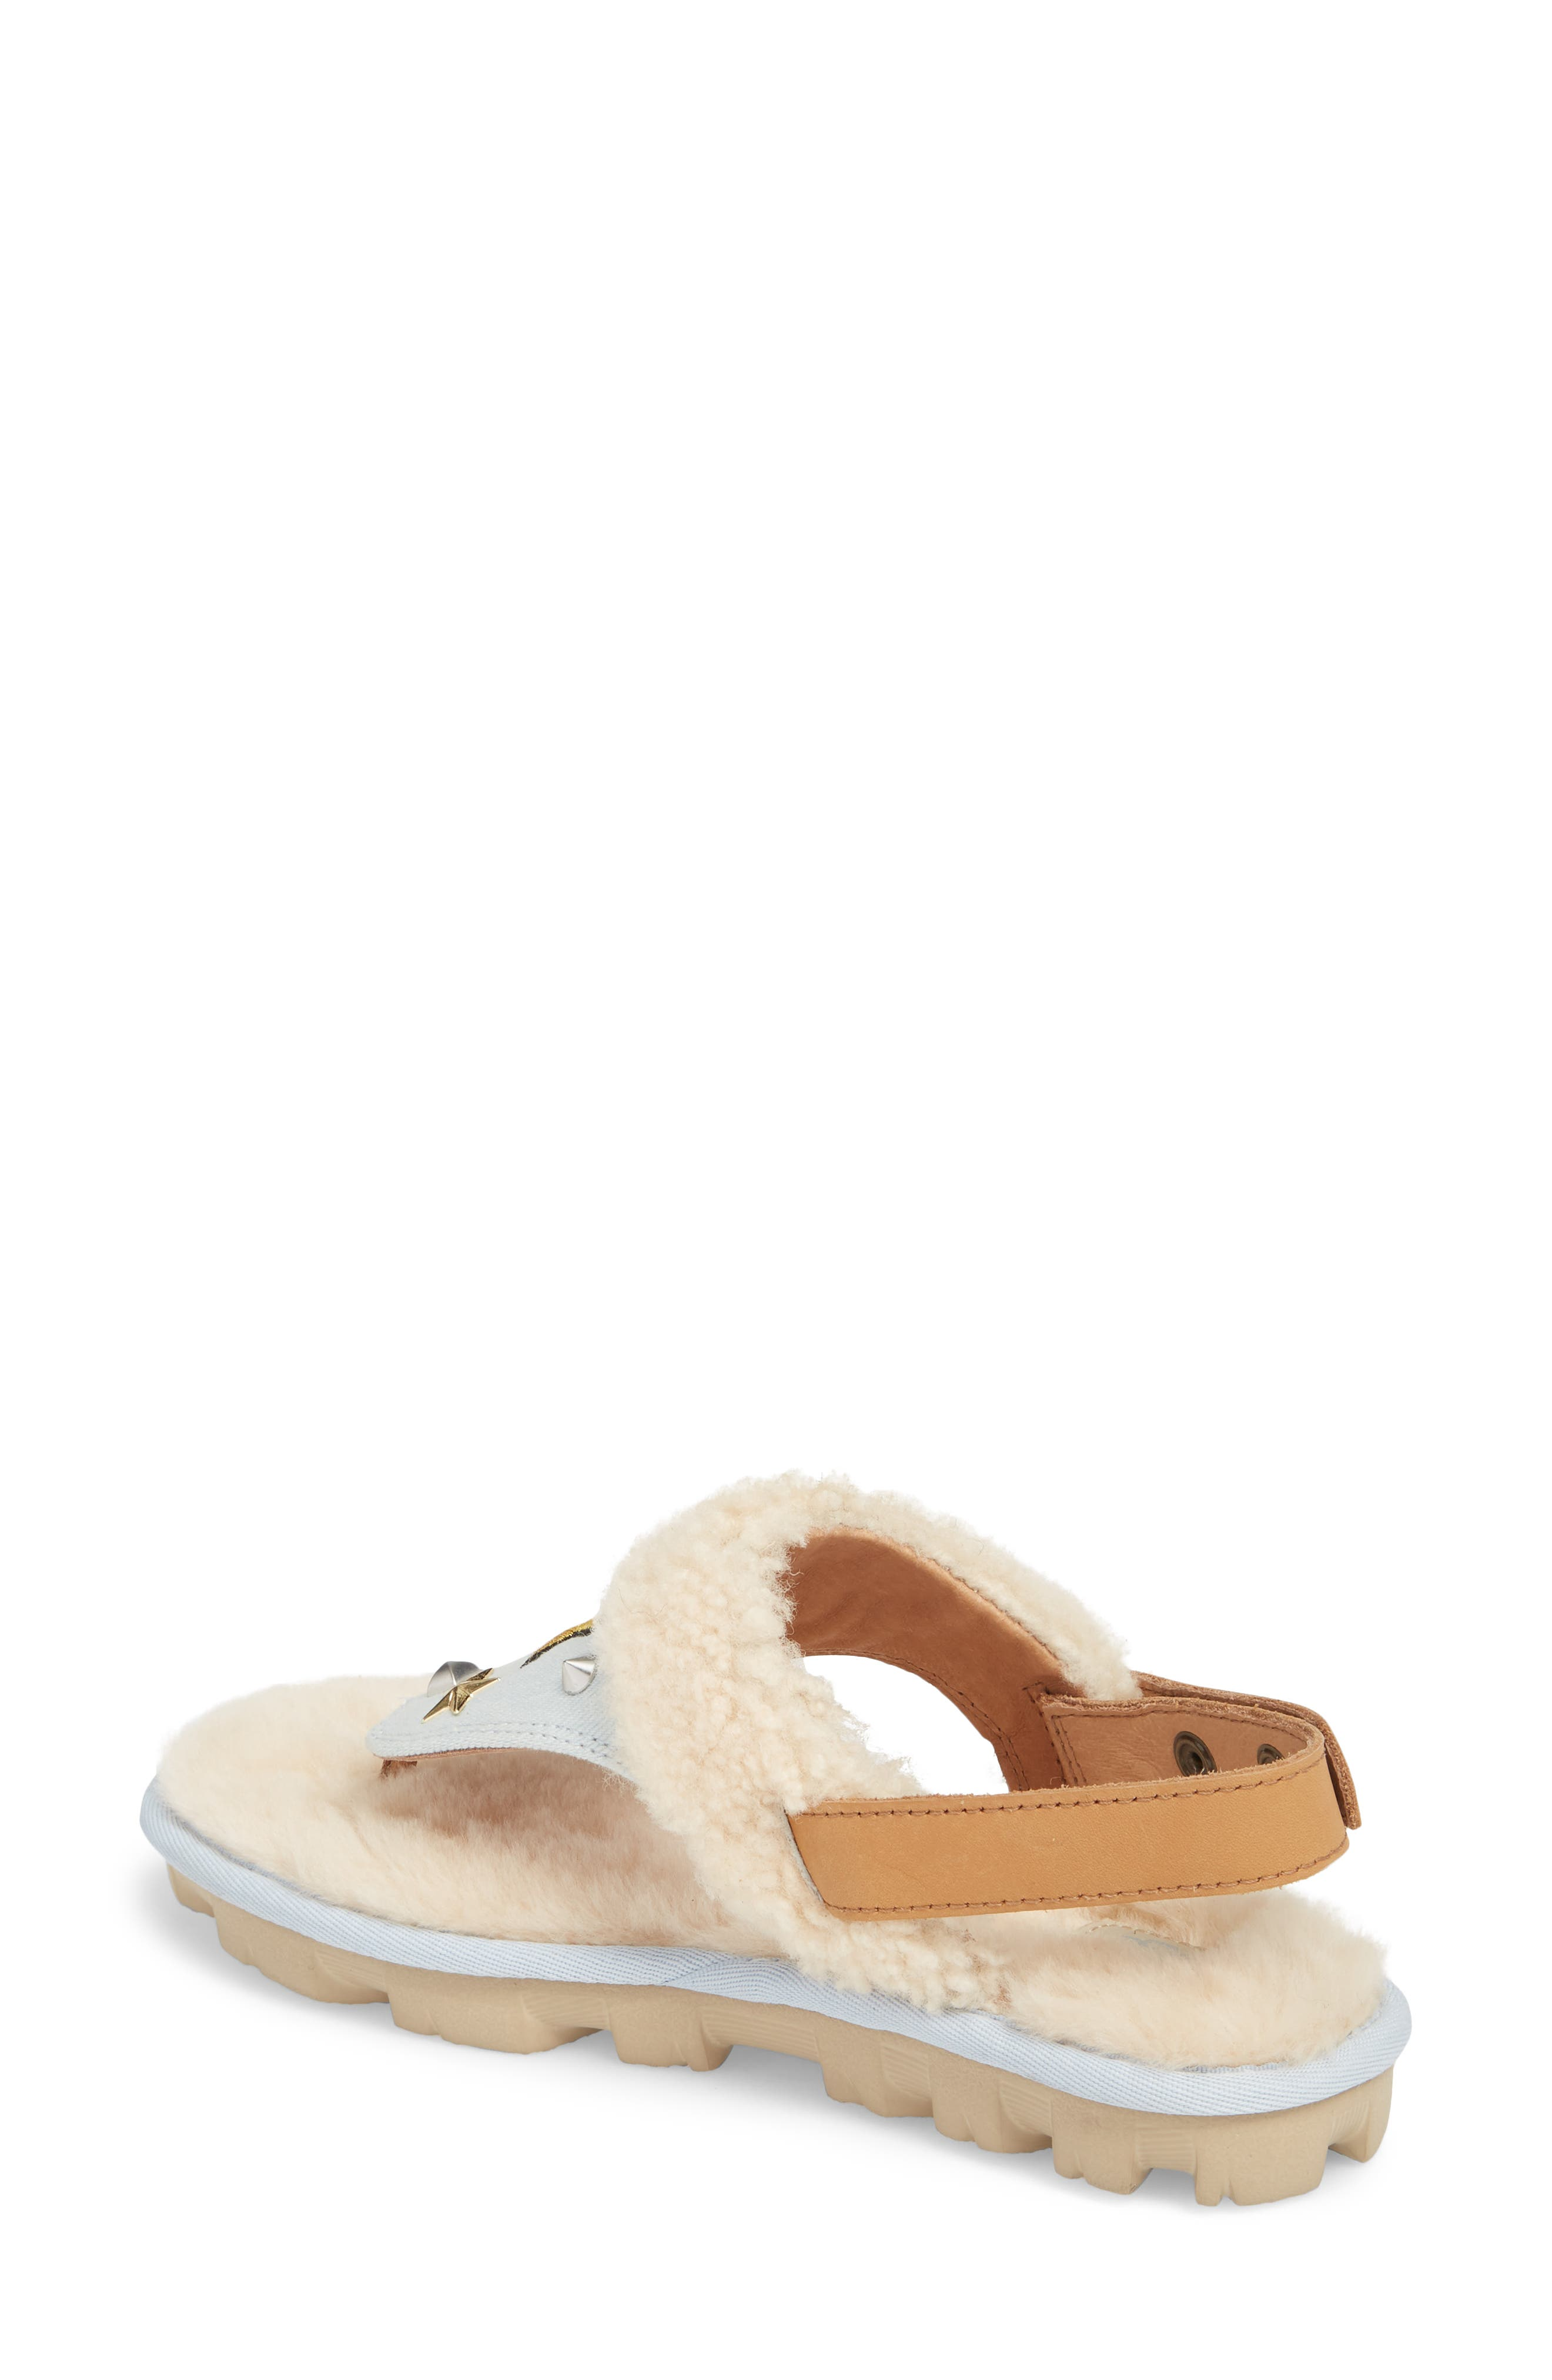 Patch It Slingback Sandal with Genuine Shearling Trim,                             Alternate thumbnail 2, color,                             Bleach Denim